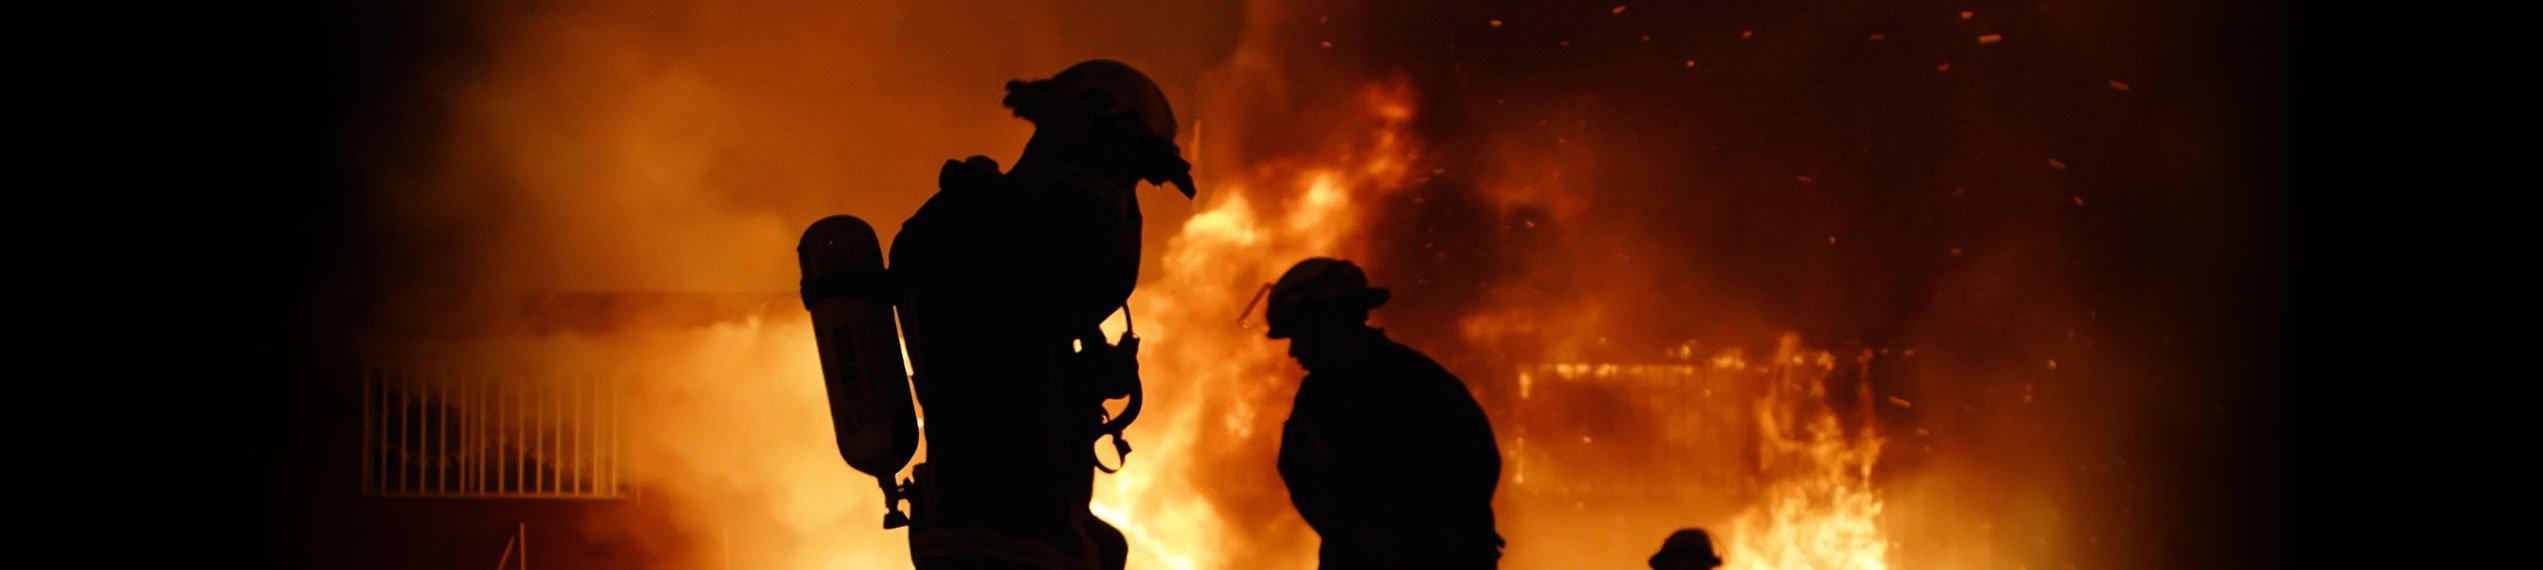 Fire & Smoke Damage Removal in Paul Davis Restoration of Morris and Passaic Counties NJ